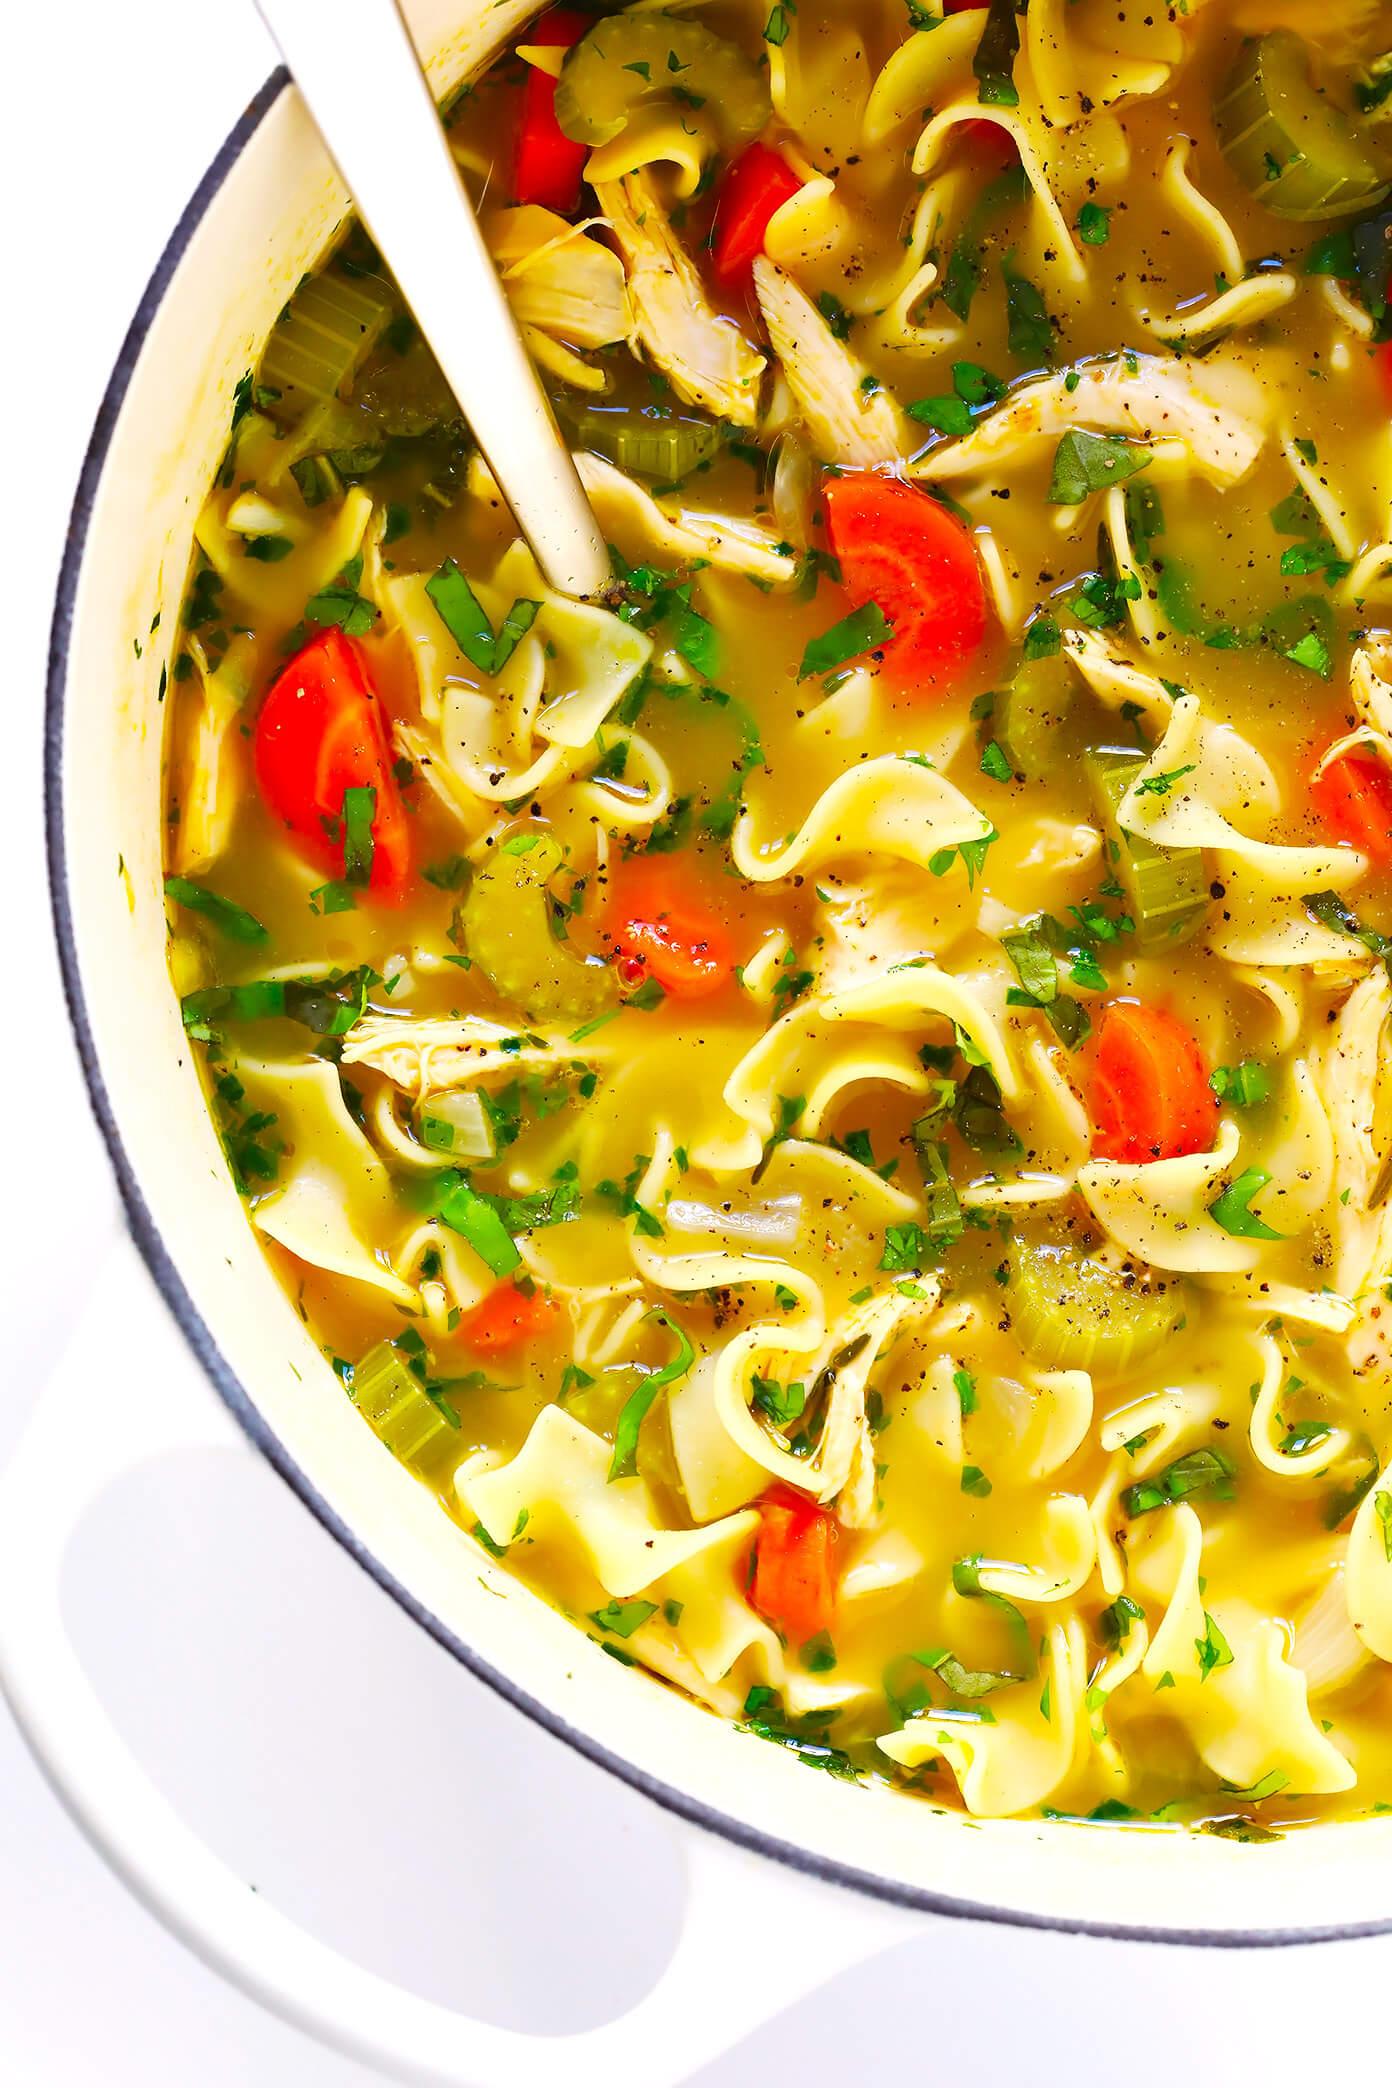 New Fall Menu; Chicken Noodle Soup!